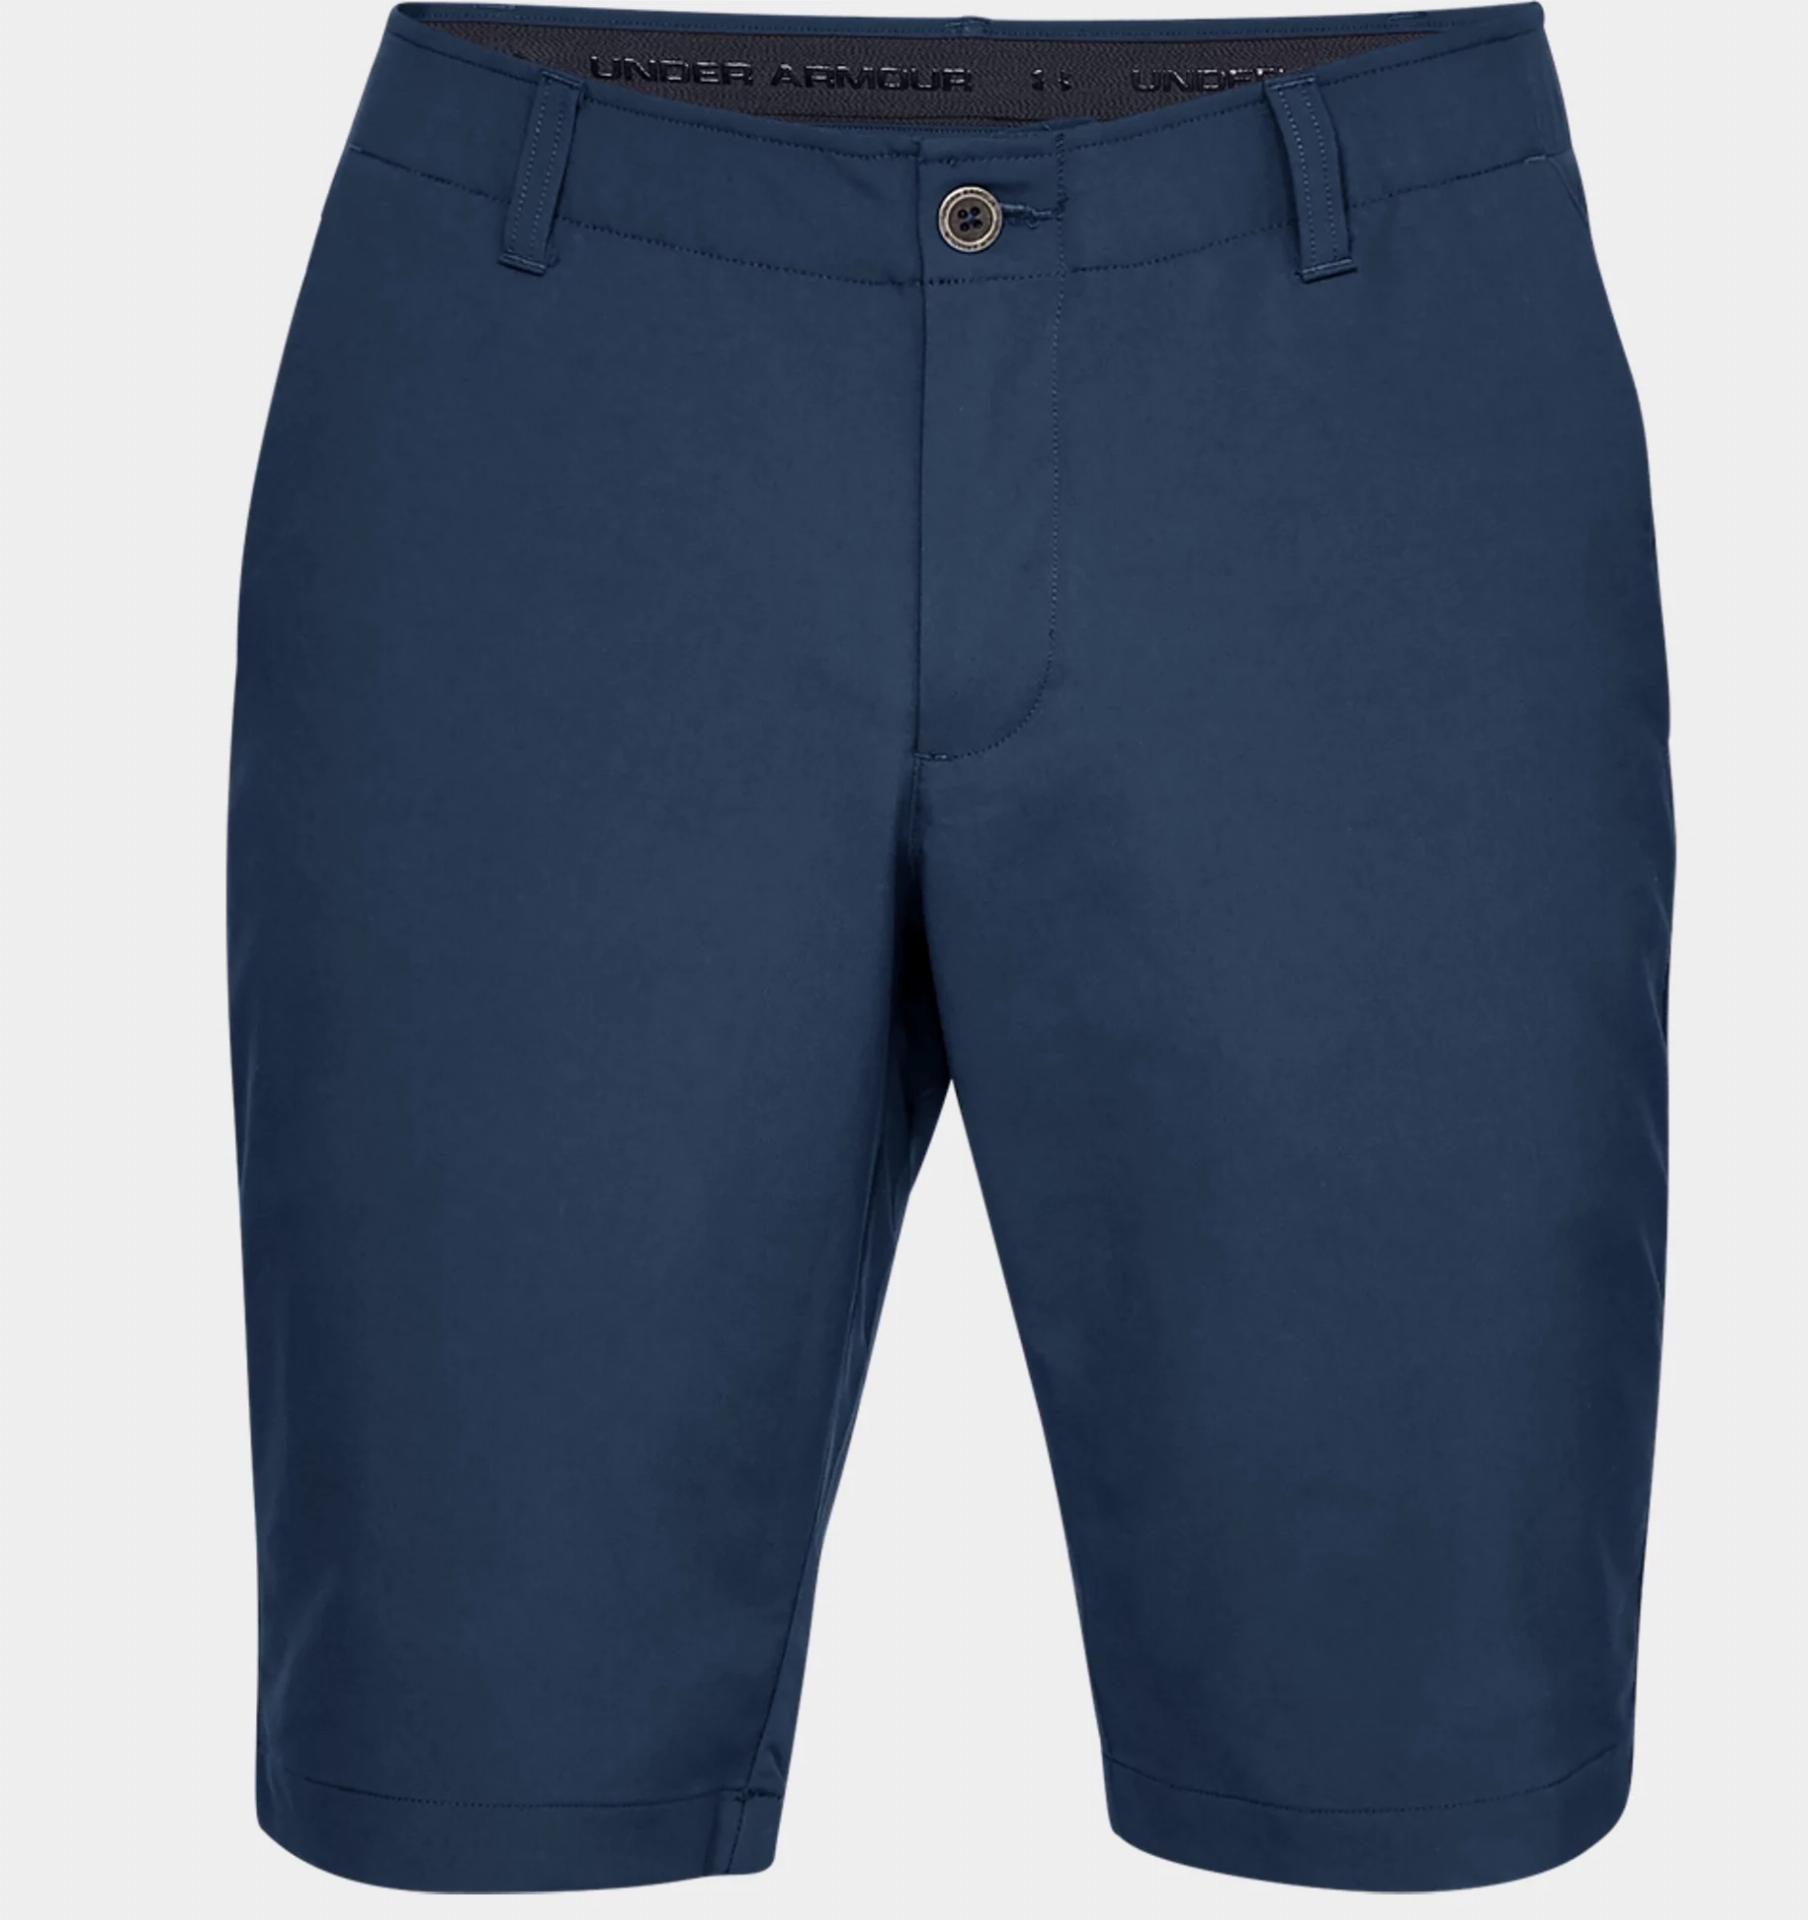 EU Performance Taper Shorts